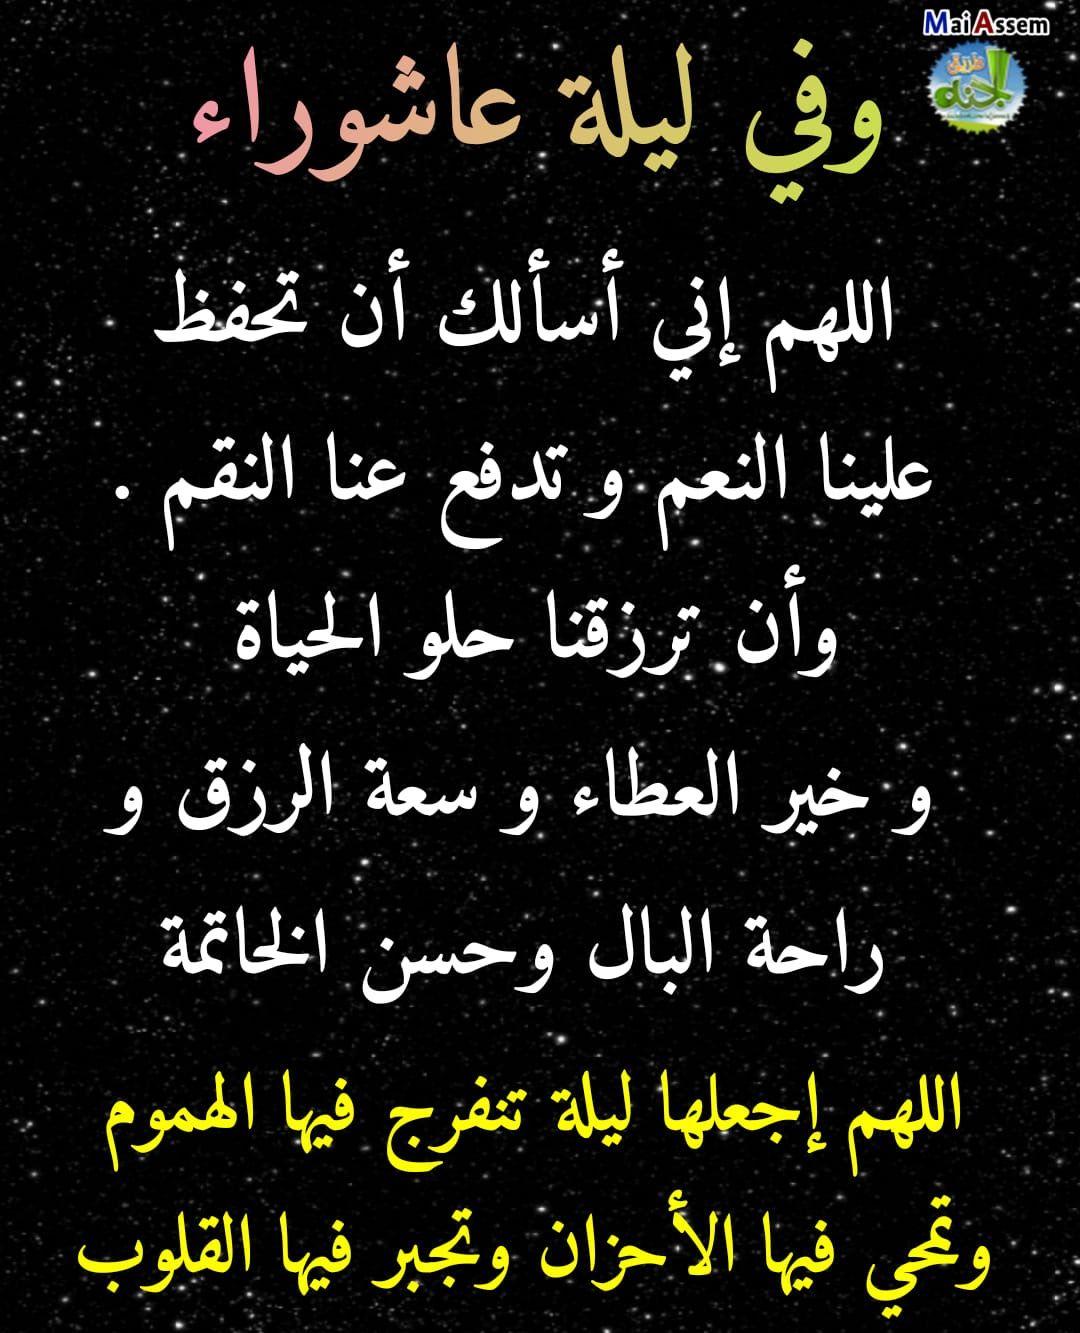 Pin By Fatima A On أدعية وتأملات قرأنية Quran Quotes Islamic Quotes Quran Islamic Quotes